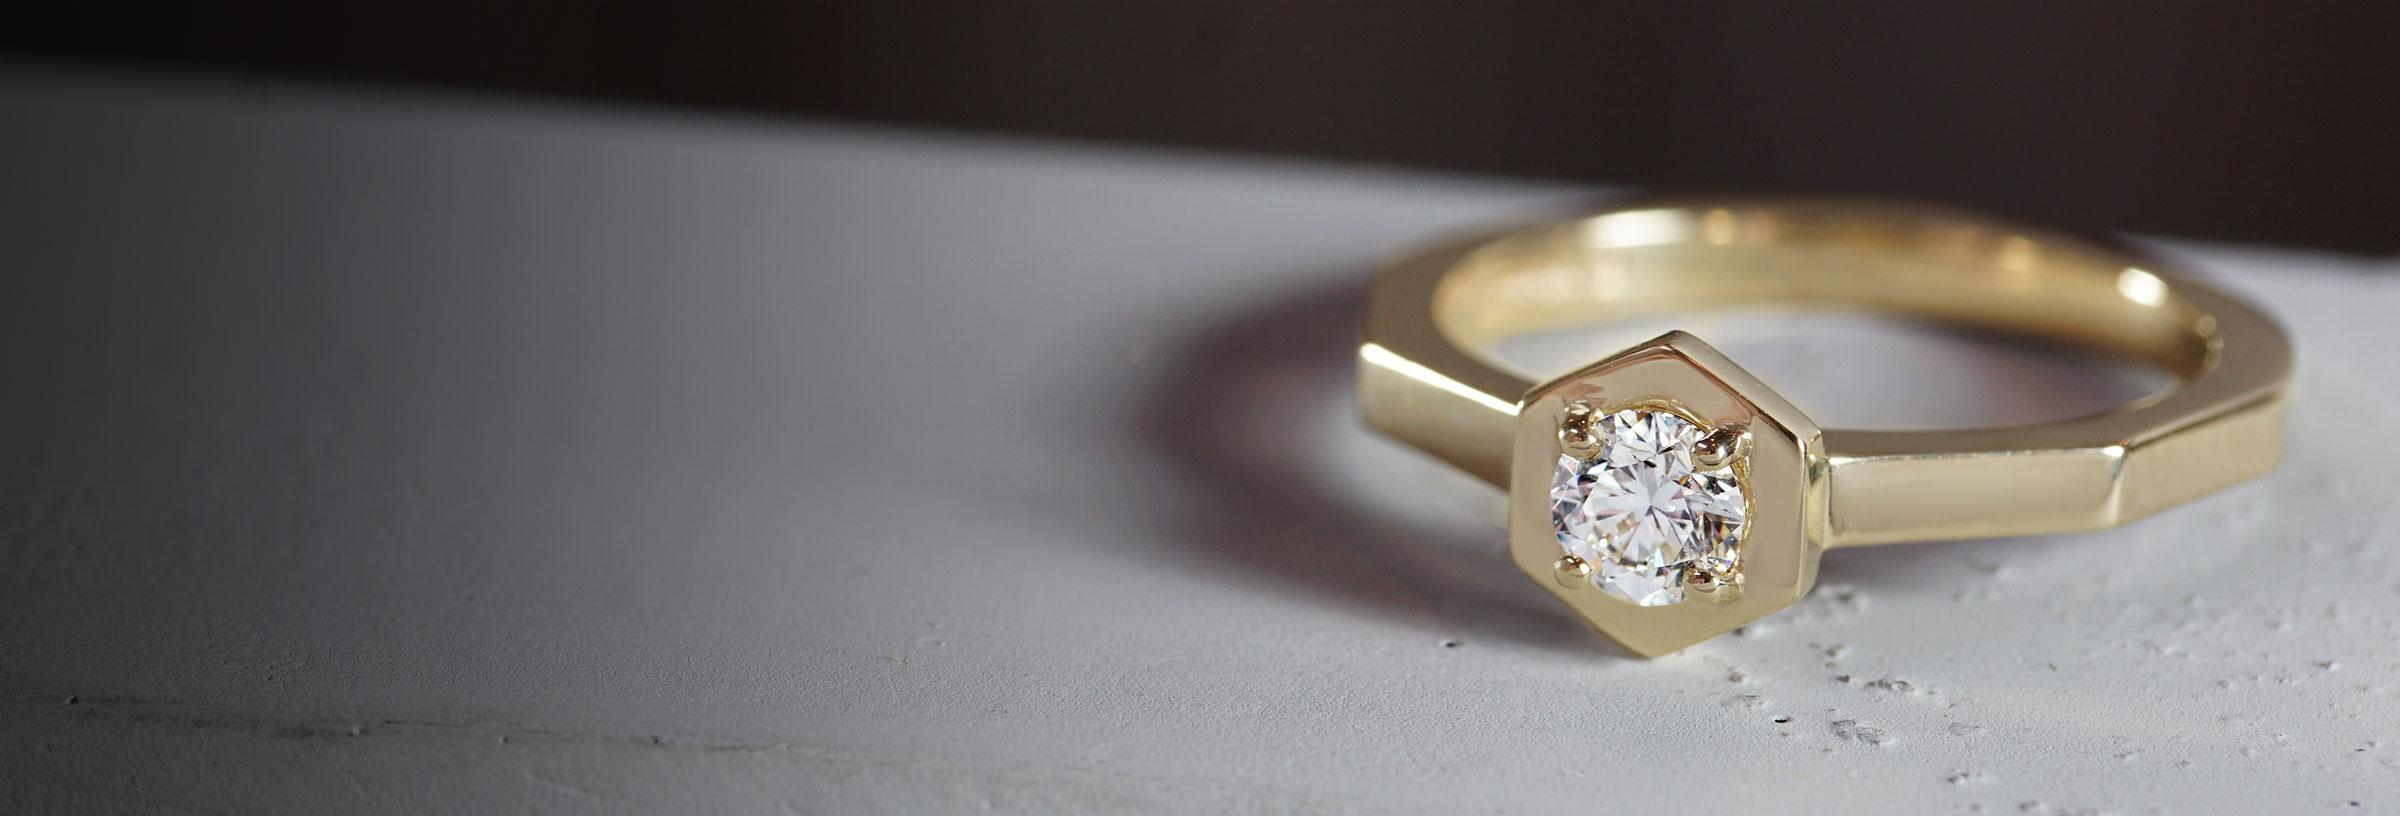 yellow-gold-hexagonal-engagement-ring-with-hexagonal-set-diamond